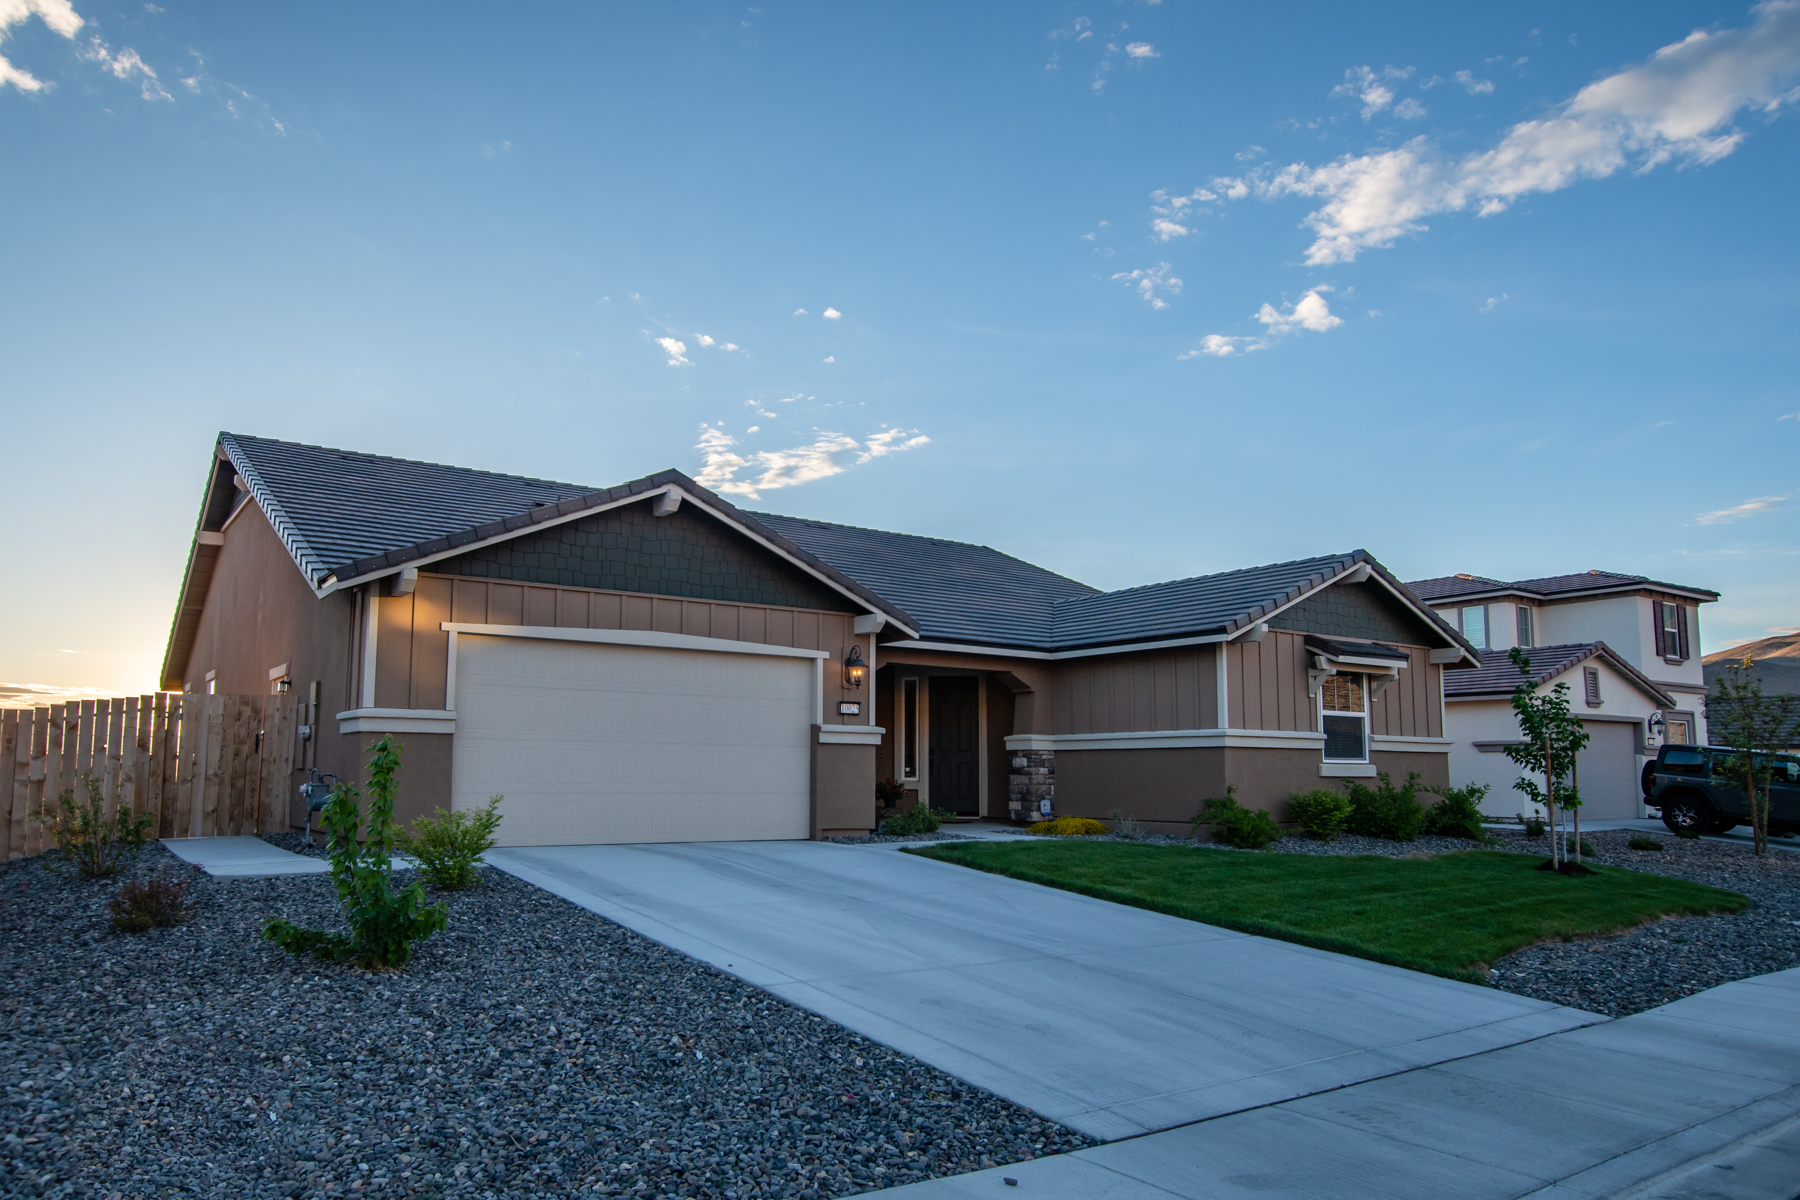 Single Family Home for Active at 10025 Barrel Racer Drive, Reno NV 89511 10025 Barrel Racer Road Reno, Nevada 89511 United States